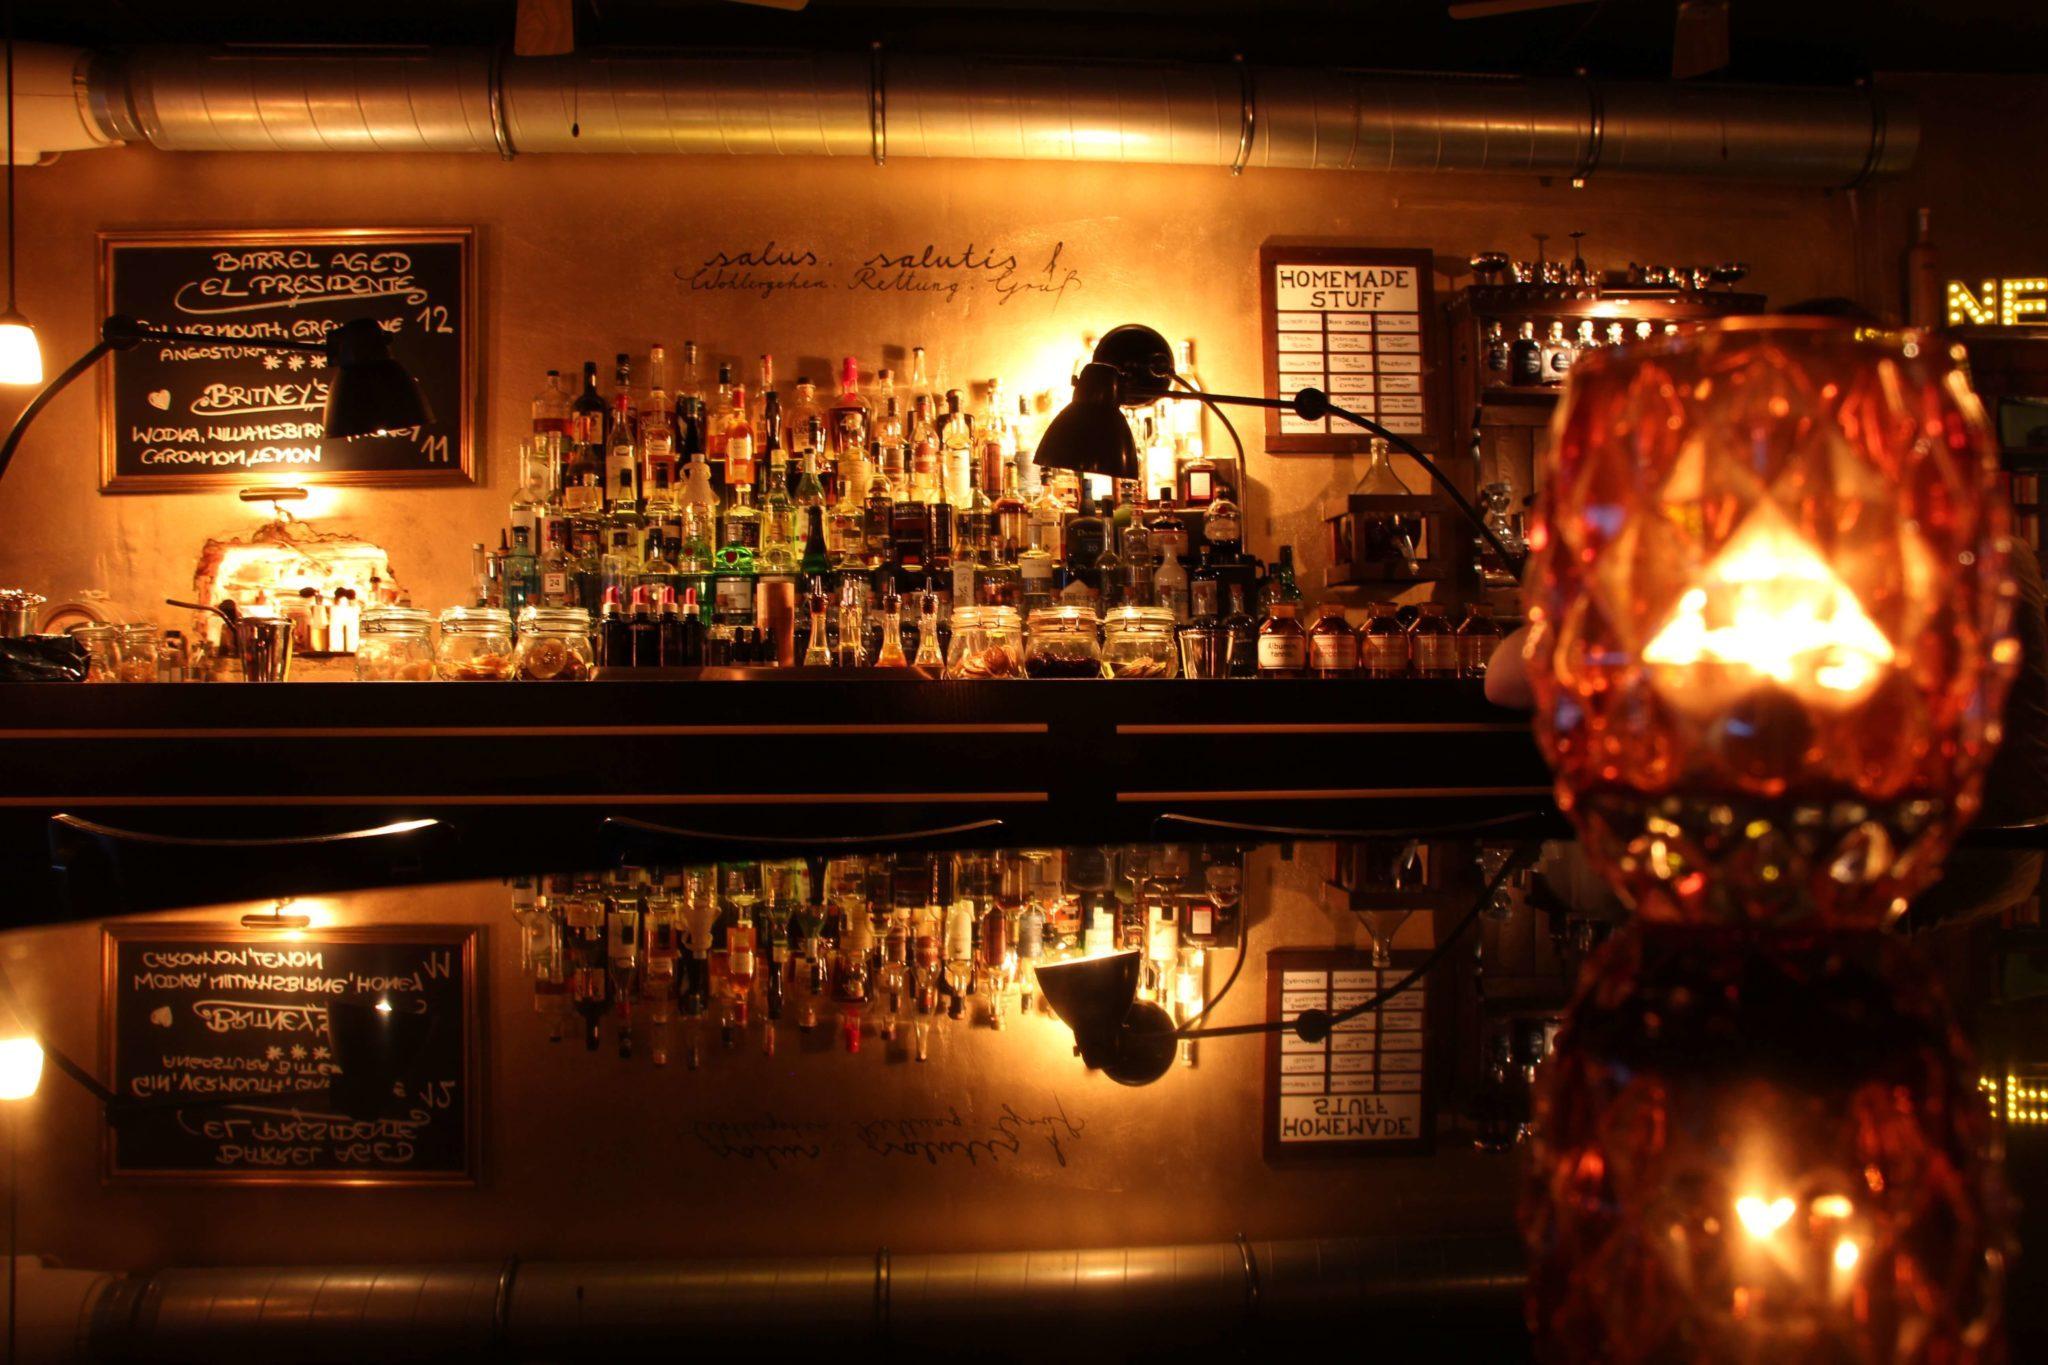 DIe Bar in der Salut Bar in Berlin